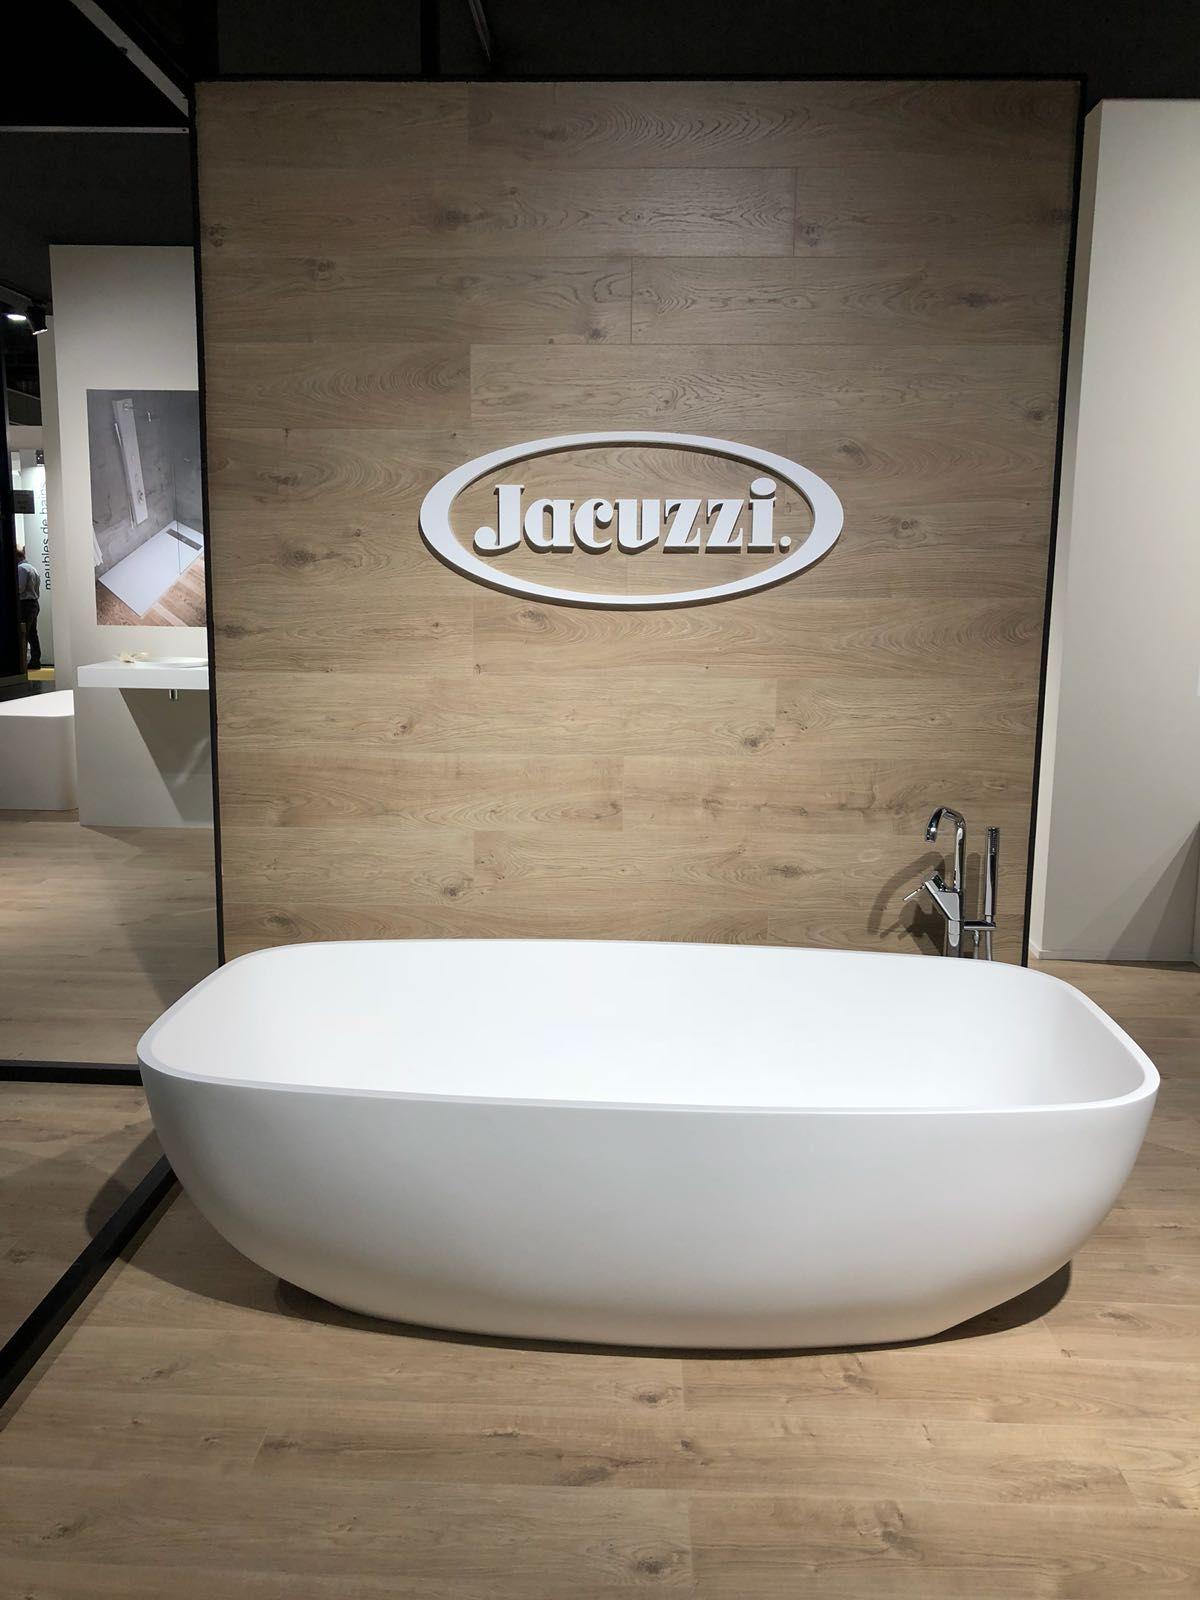 bañera de la marca jacuzzi